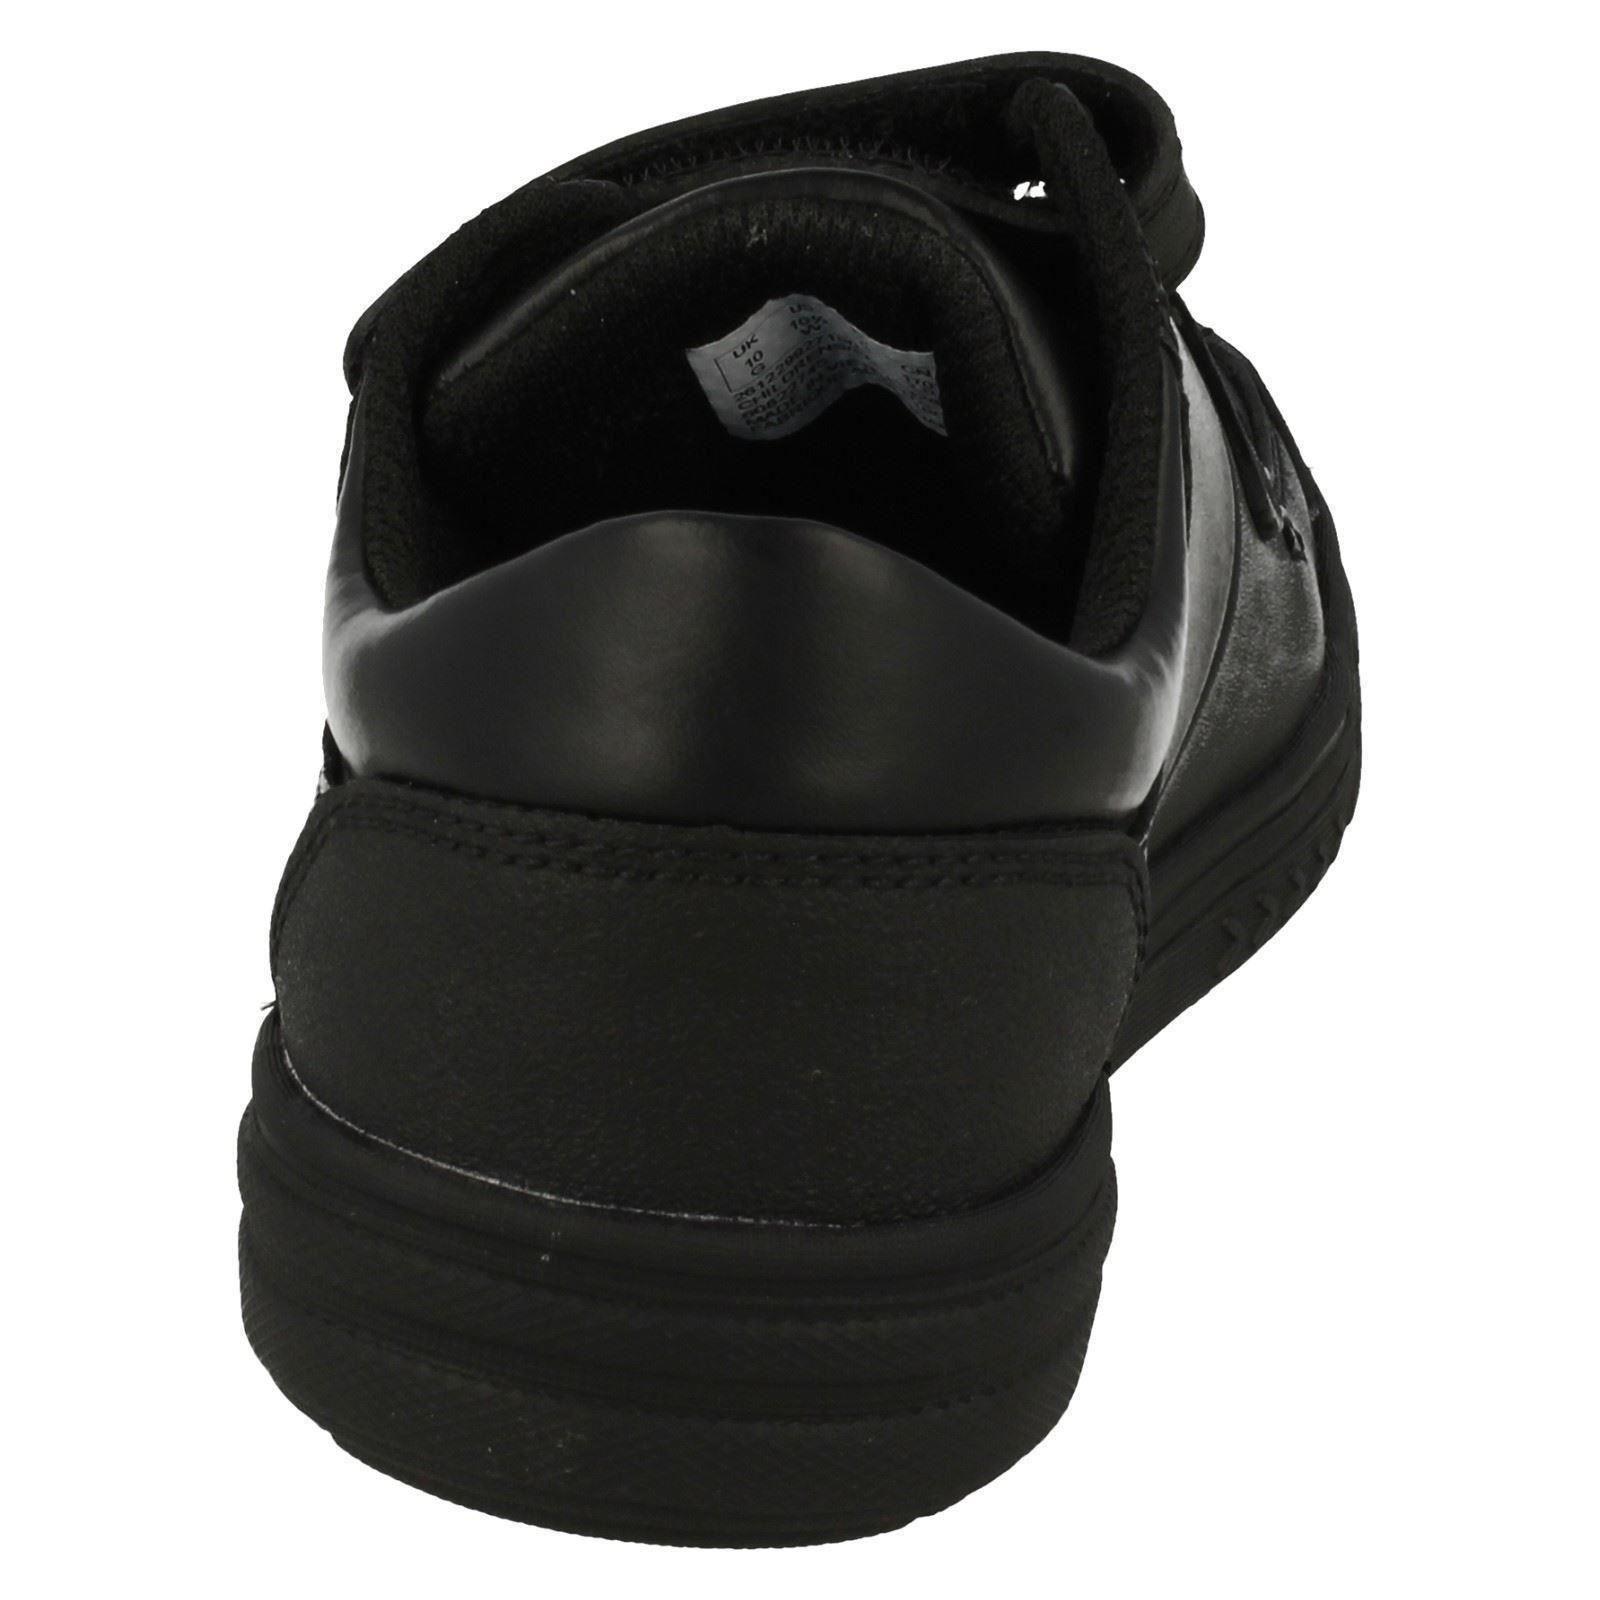 Chad Racer Clarks Boys Smart School Shoes